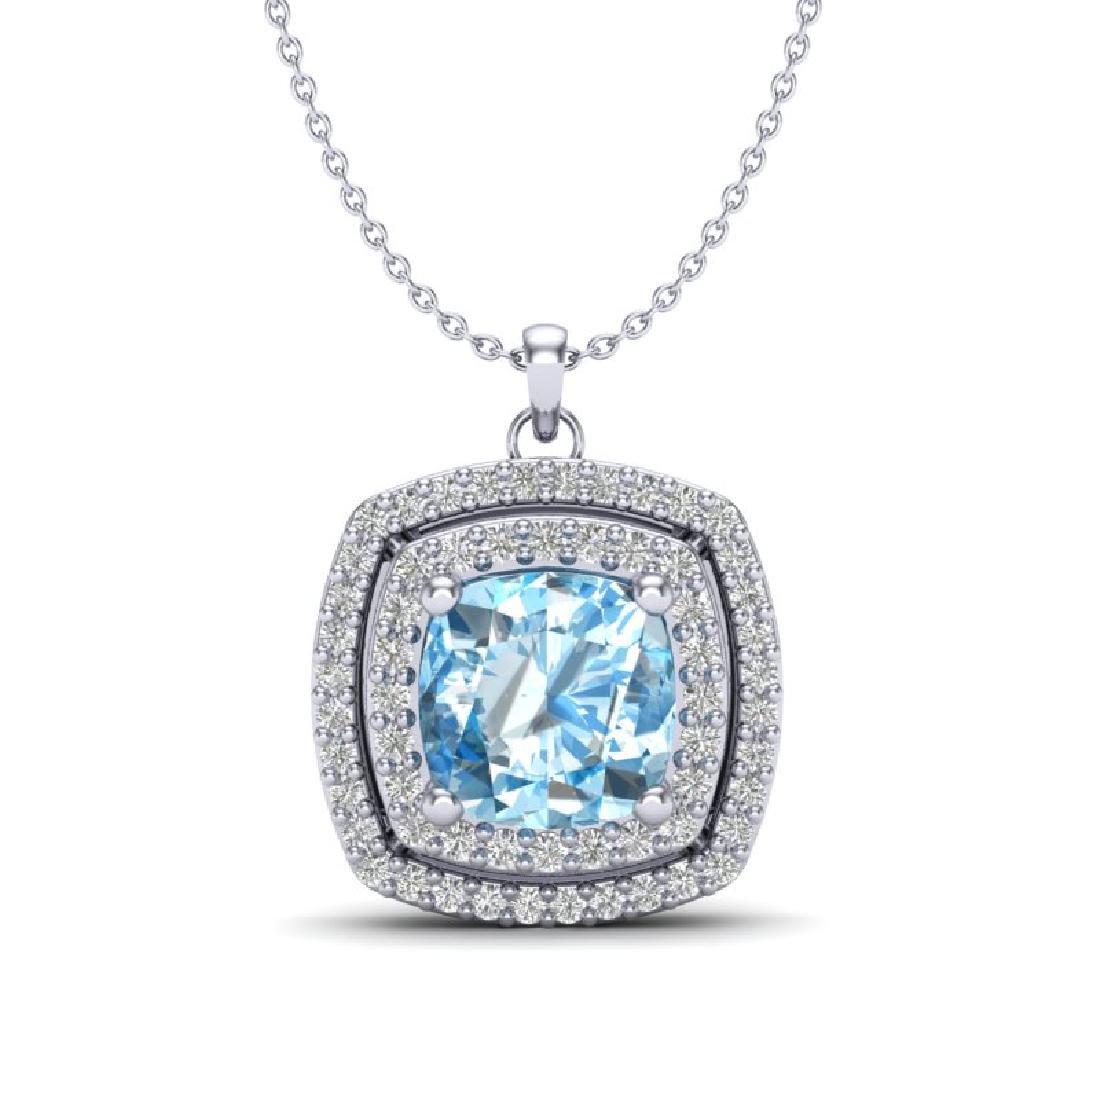 2.08 CTW Sky Blue Topaz & Micro Pave VS/SI Diamond Halo